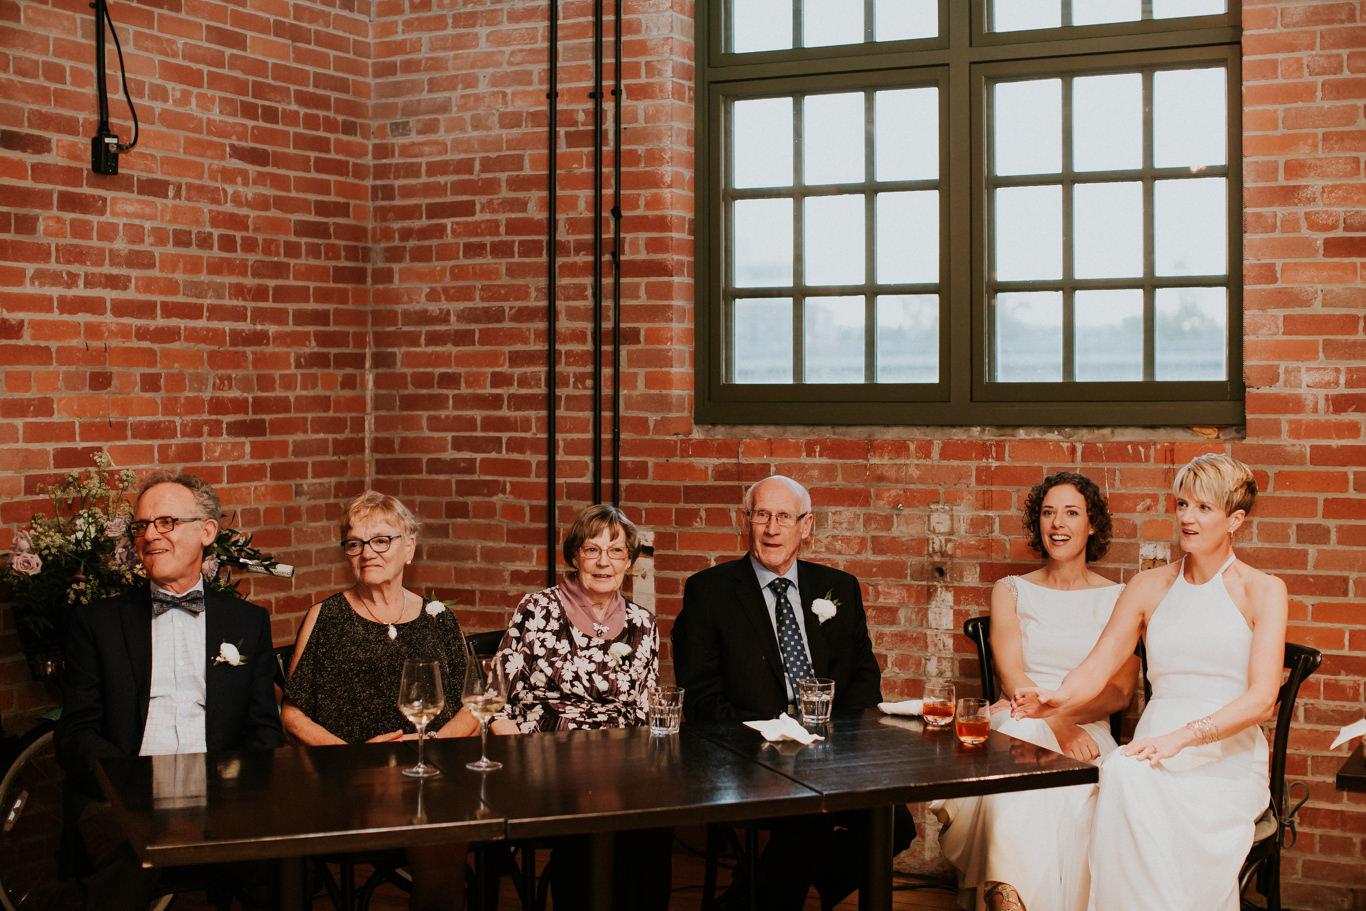 Lindsay-and-Heather-Charbar-Restaurant-Wedding-in-Calgary-165